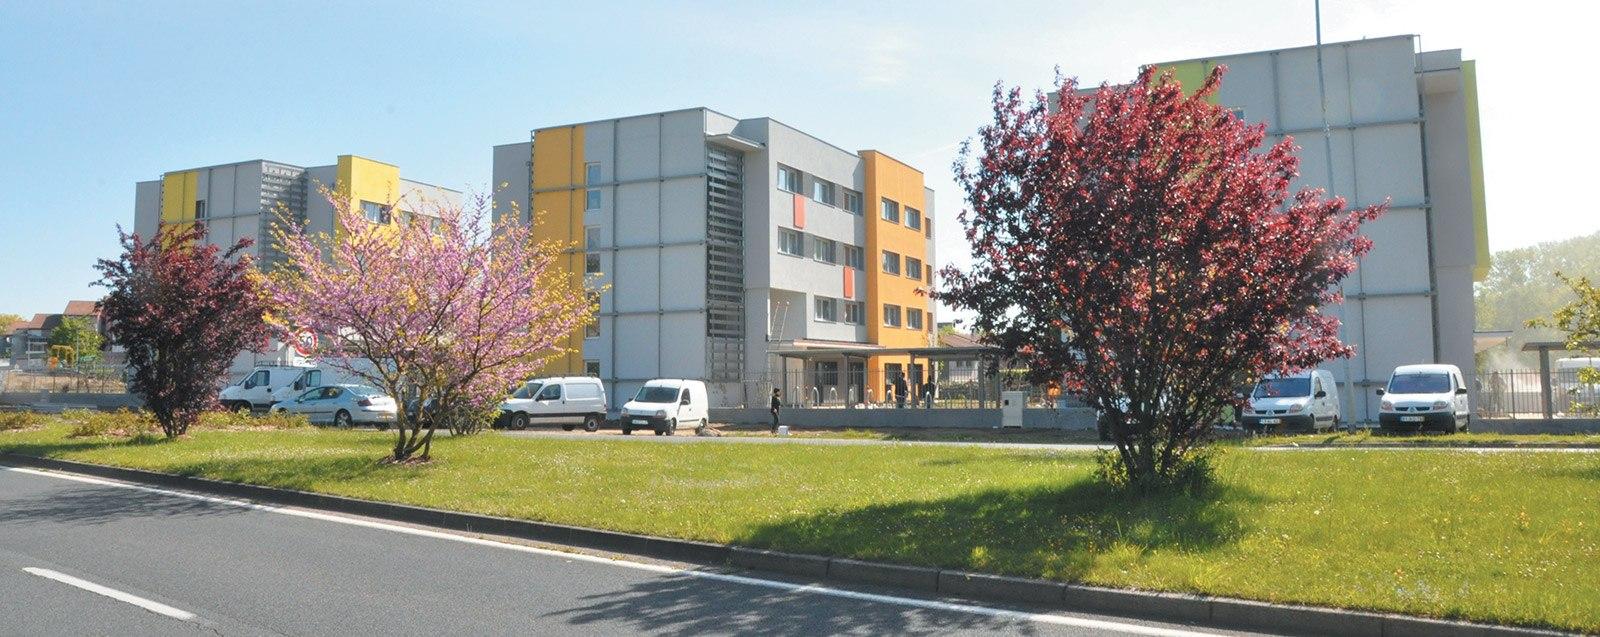 Villefontaine – La résidence étudiante - Semcoda